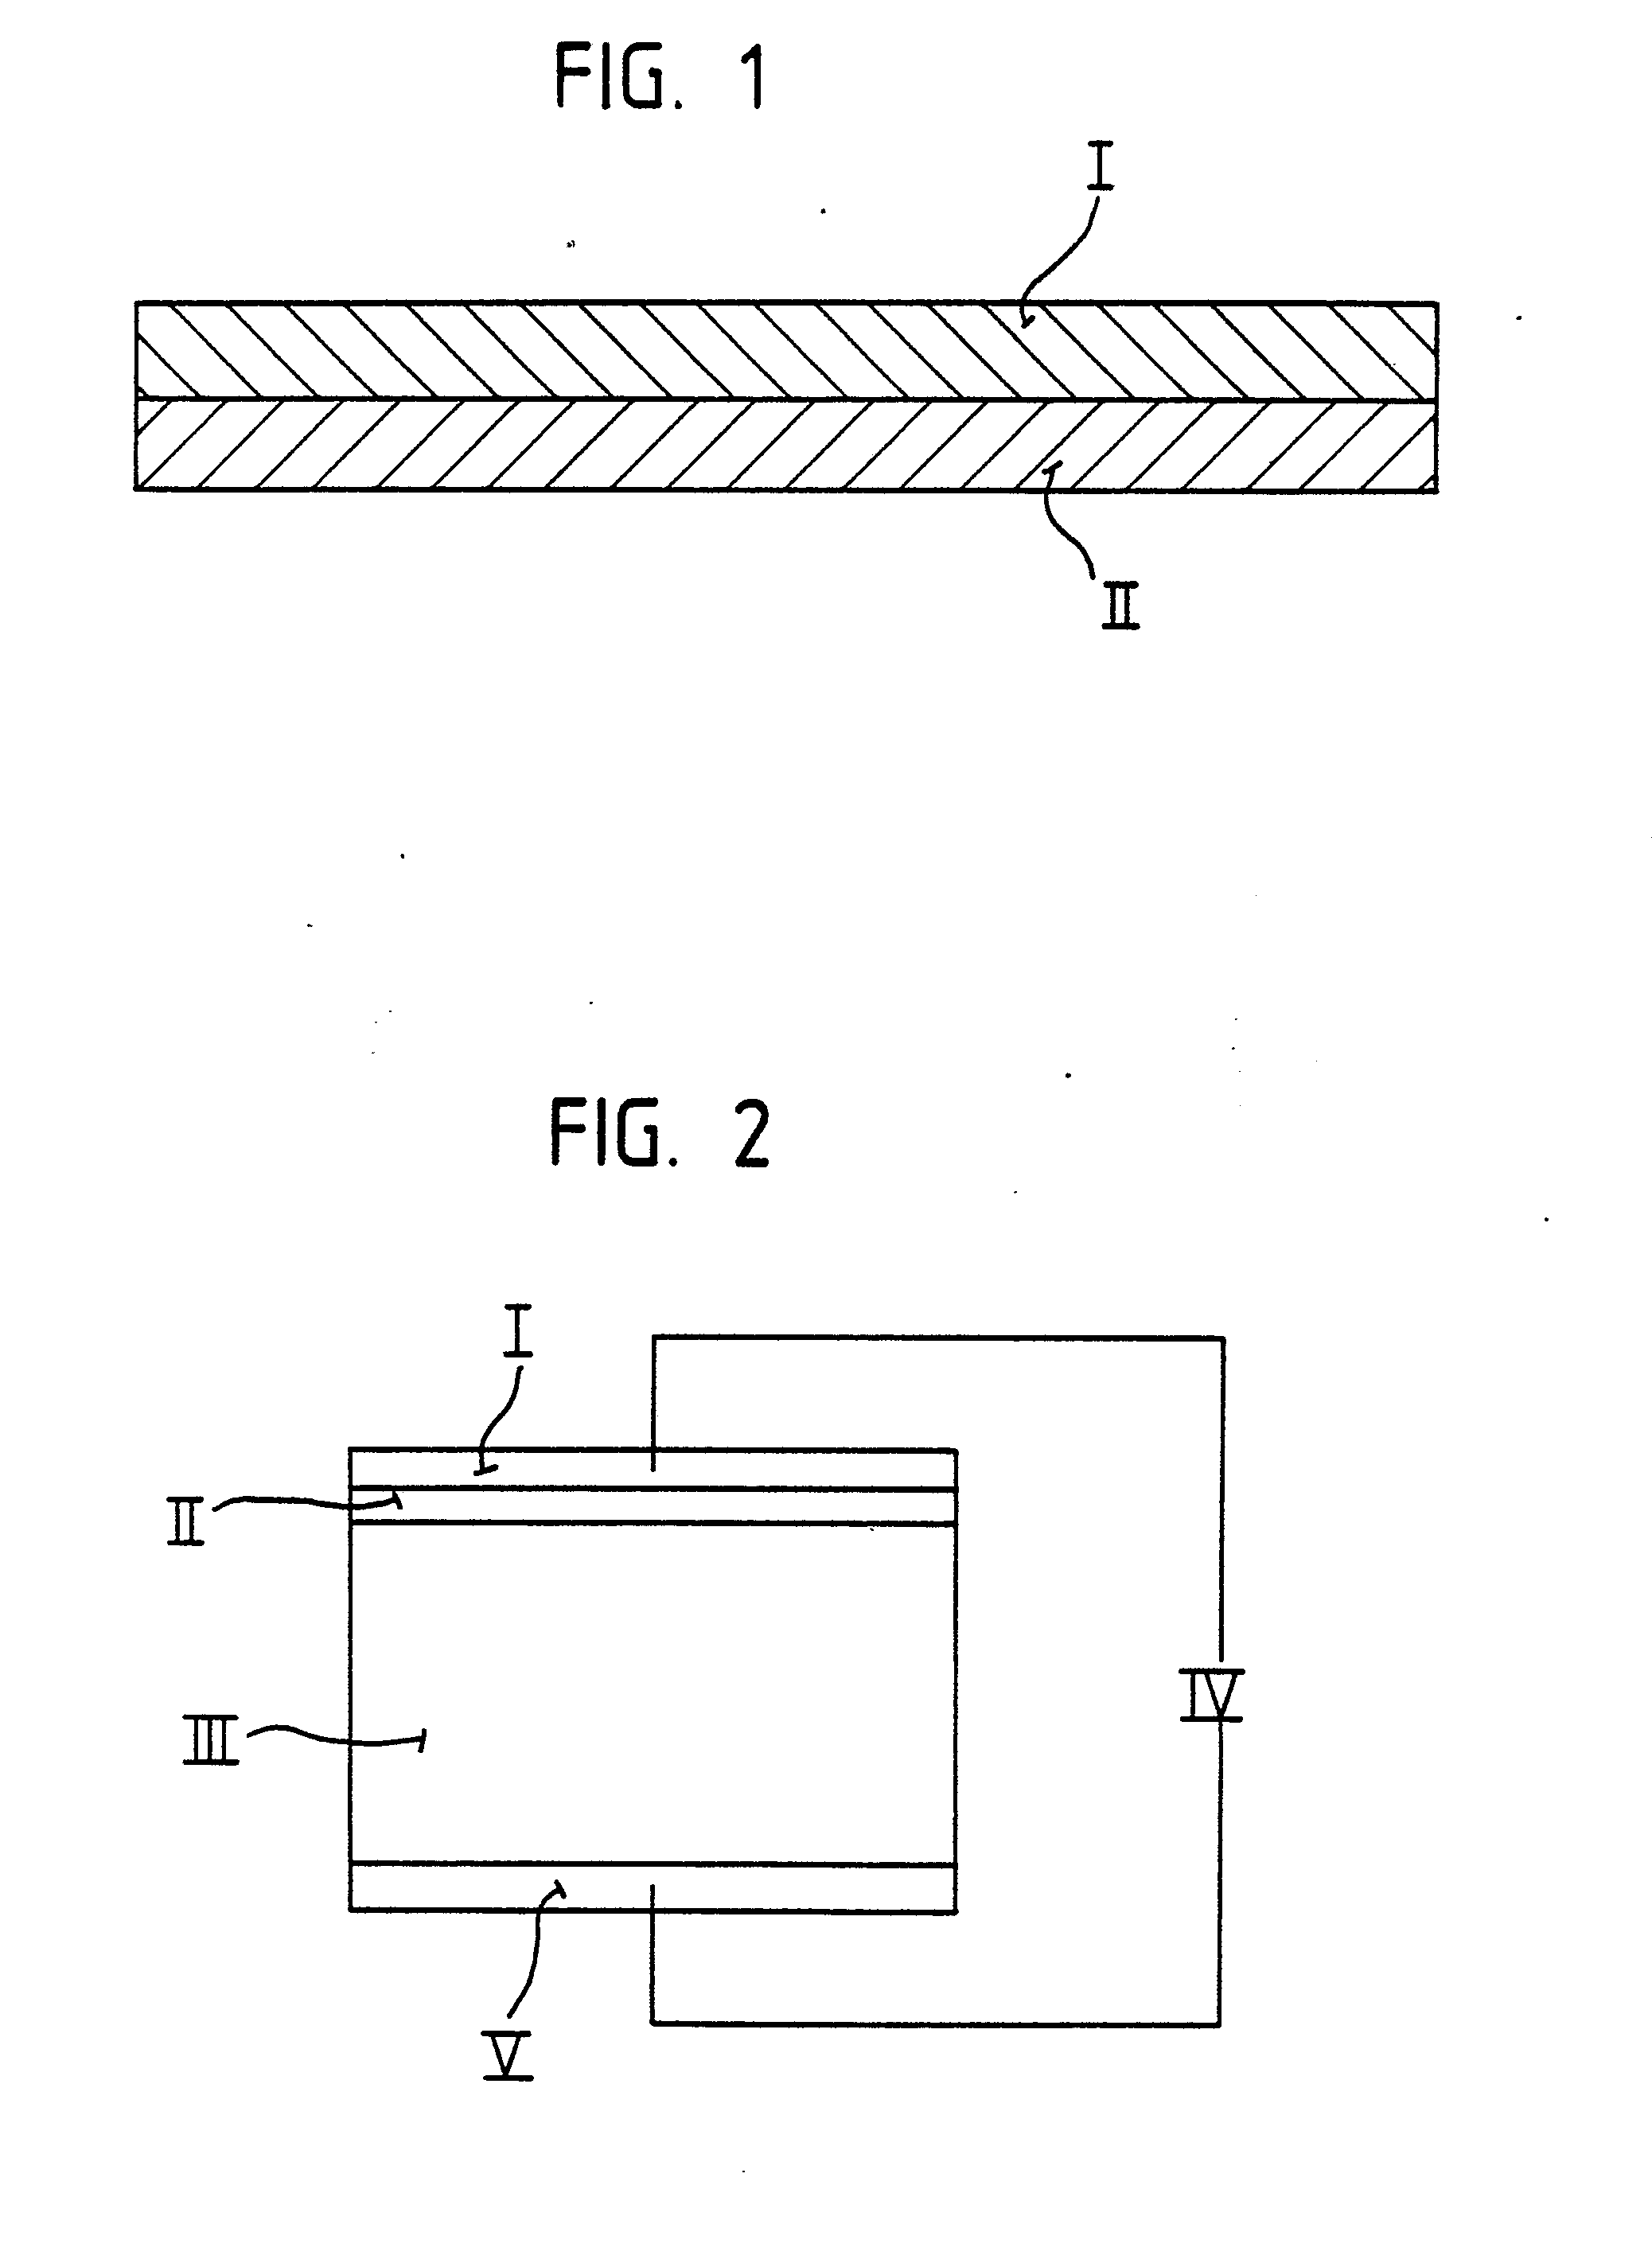 patent ep0234546a2 folien aus elektrisch leitf higen polymeren google patentsuche. Black Bedroom Furniture Sets. Home Design Ideas